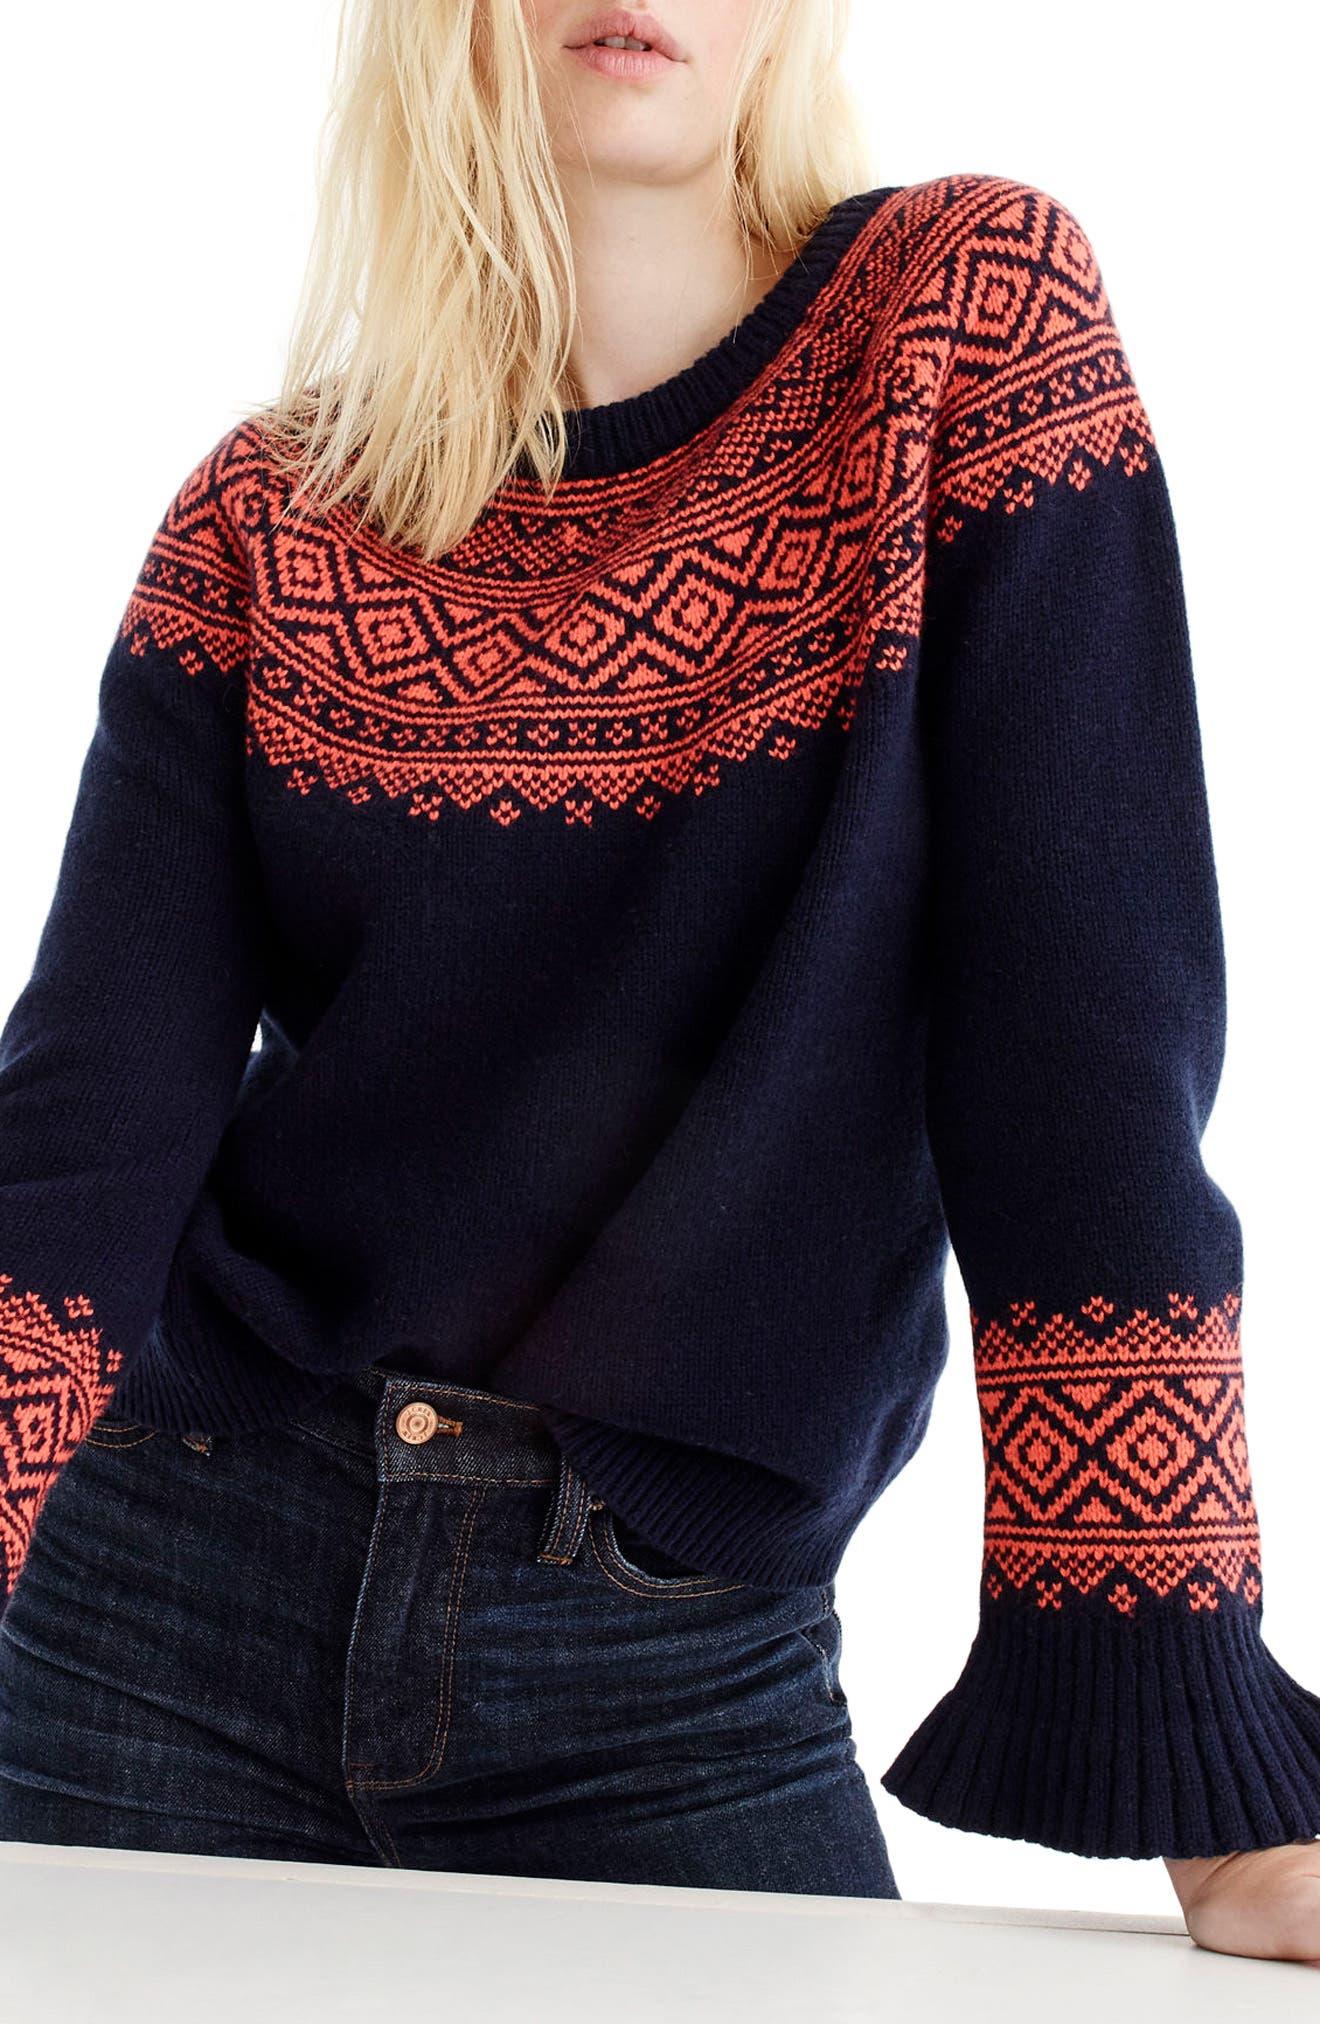 J.Crew Fair Isle Ruffle Sleeve Sweater | Nordstrom